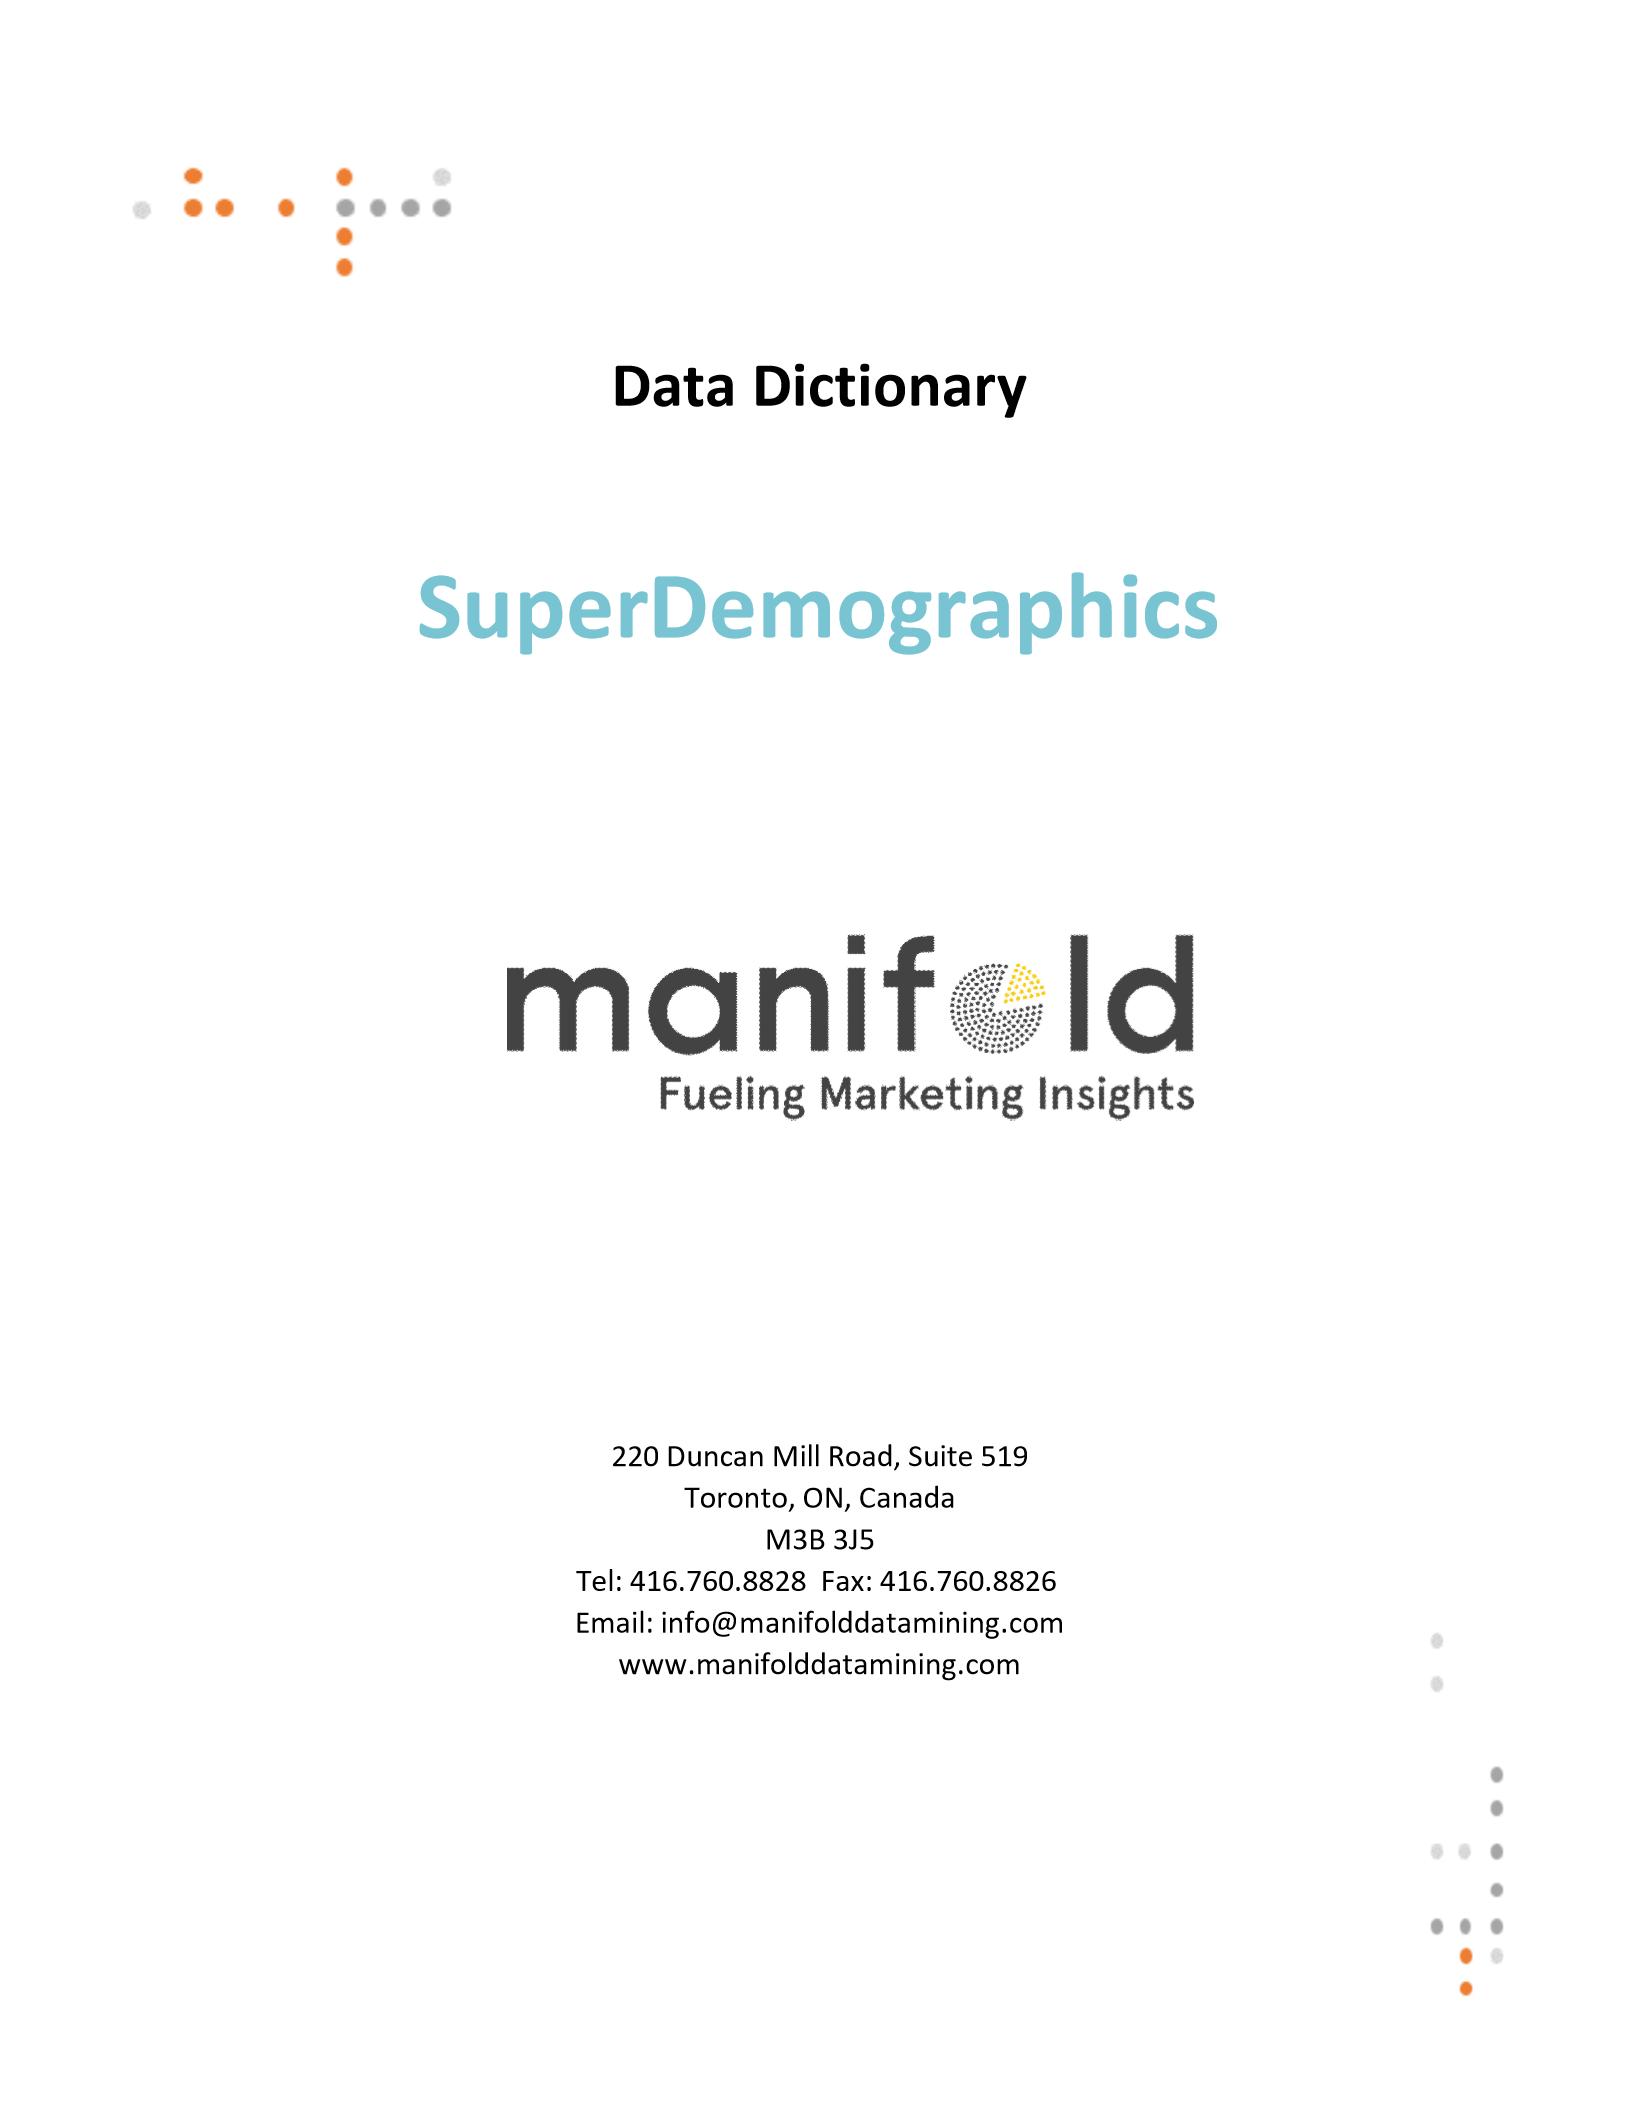 SuperDemographics